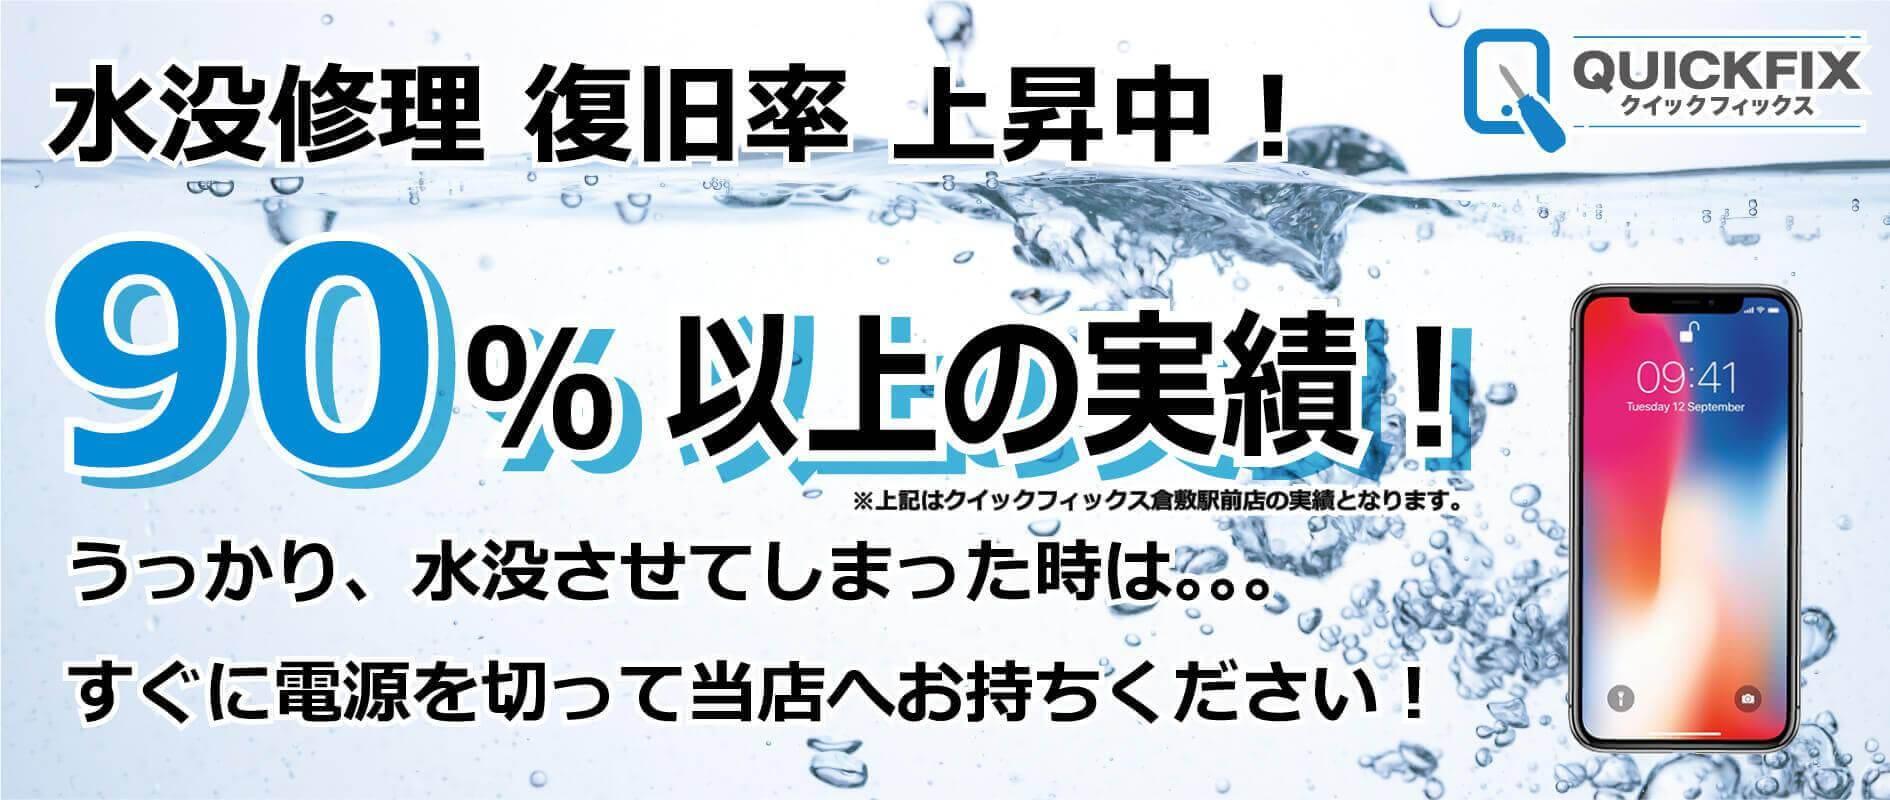 iPhone水没修理 復旧率90%以上!